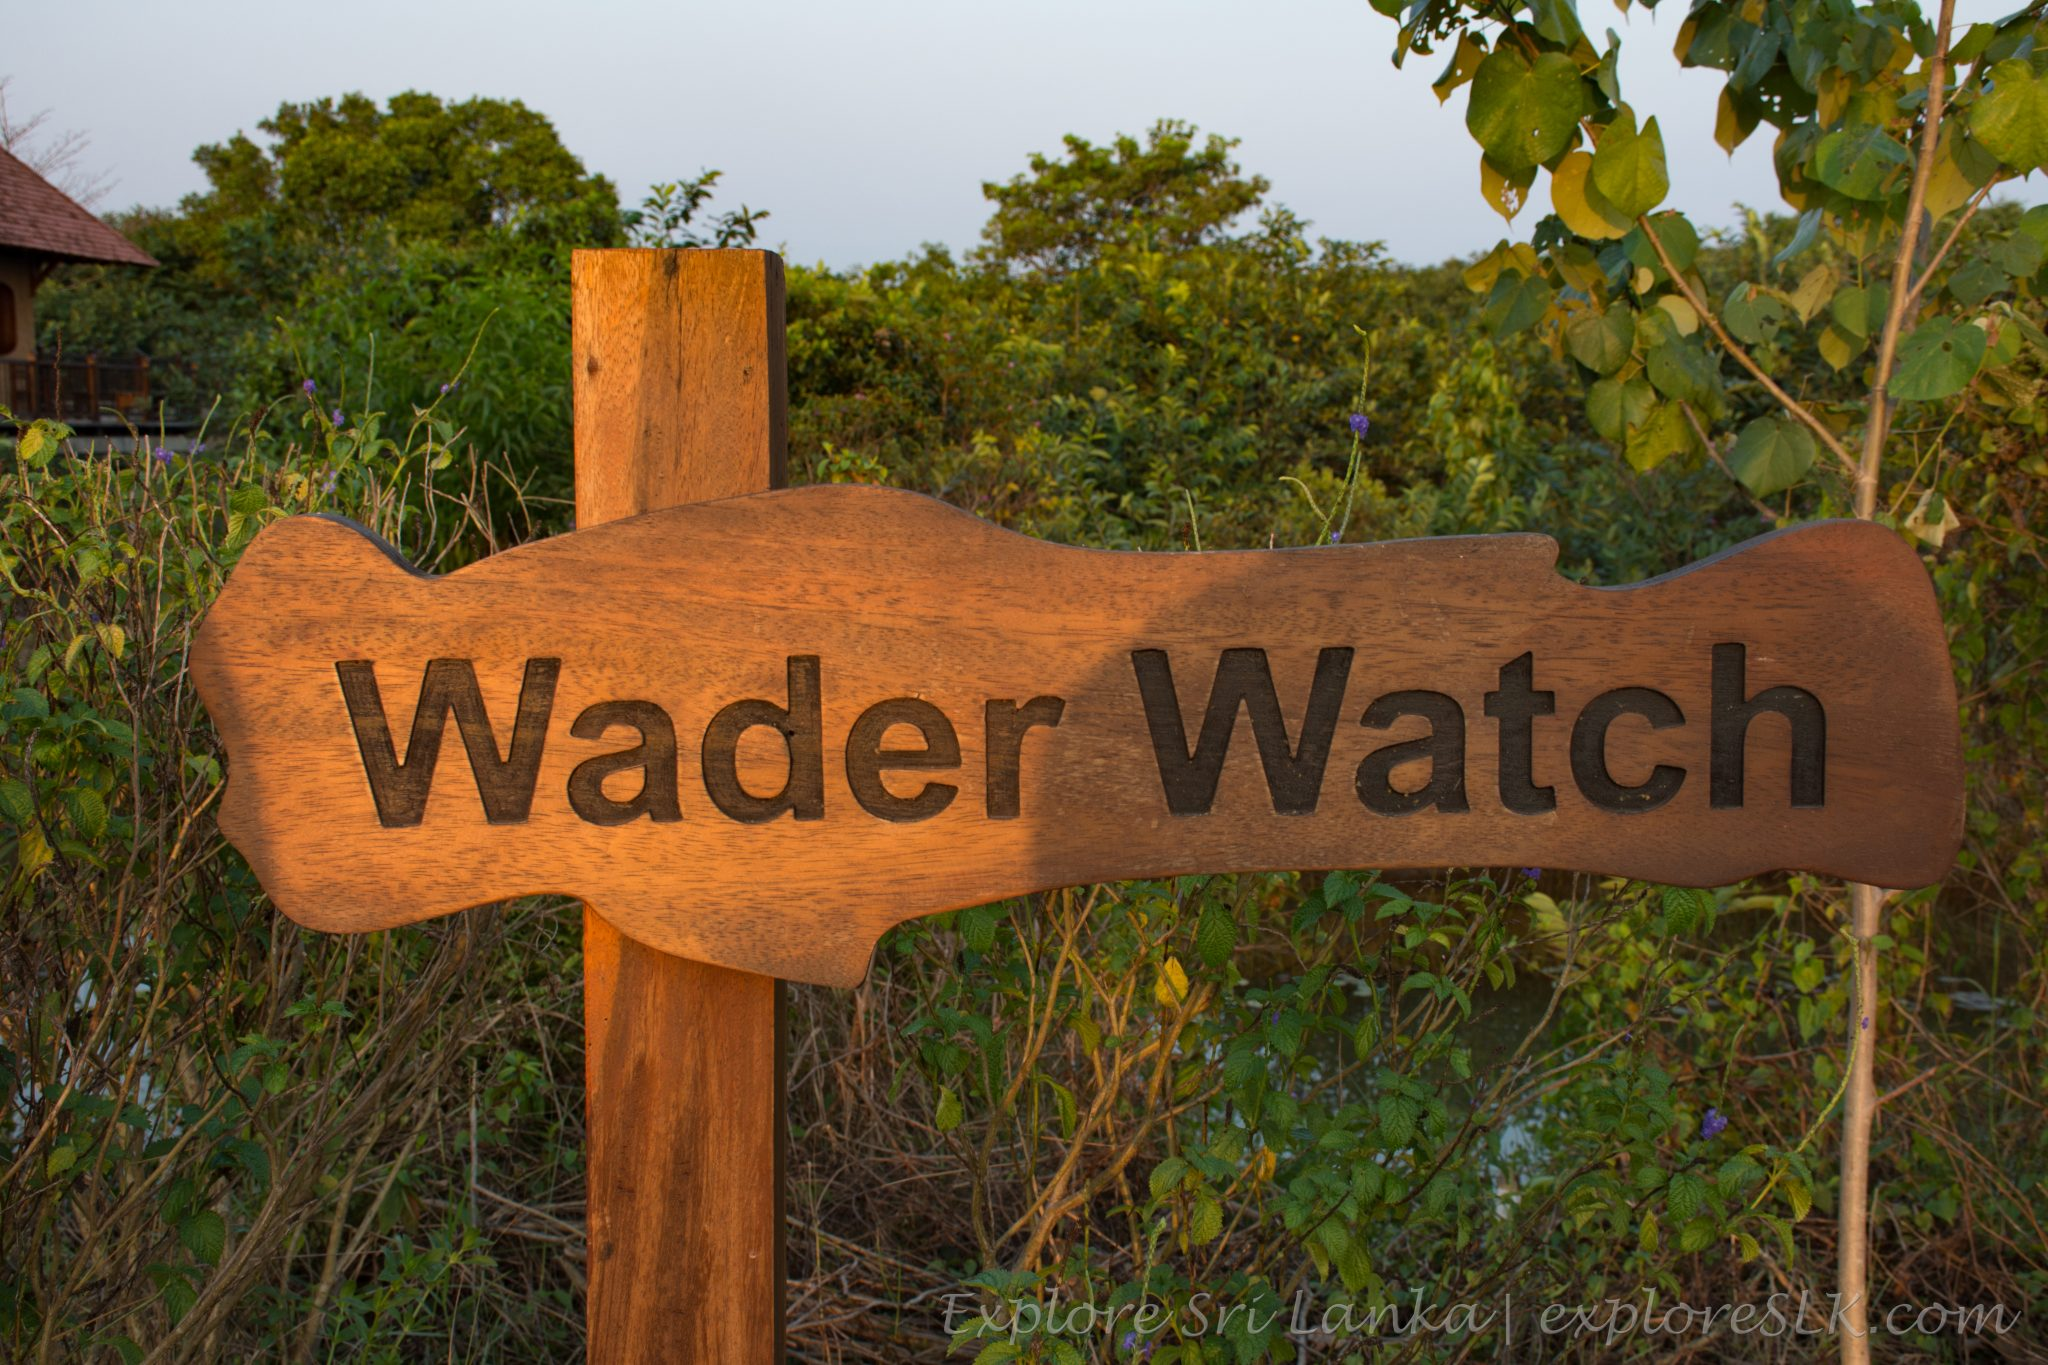 Wader watch - sign board